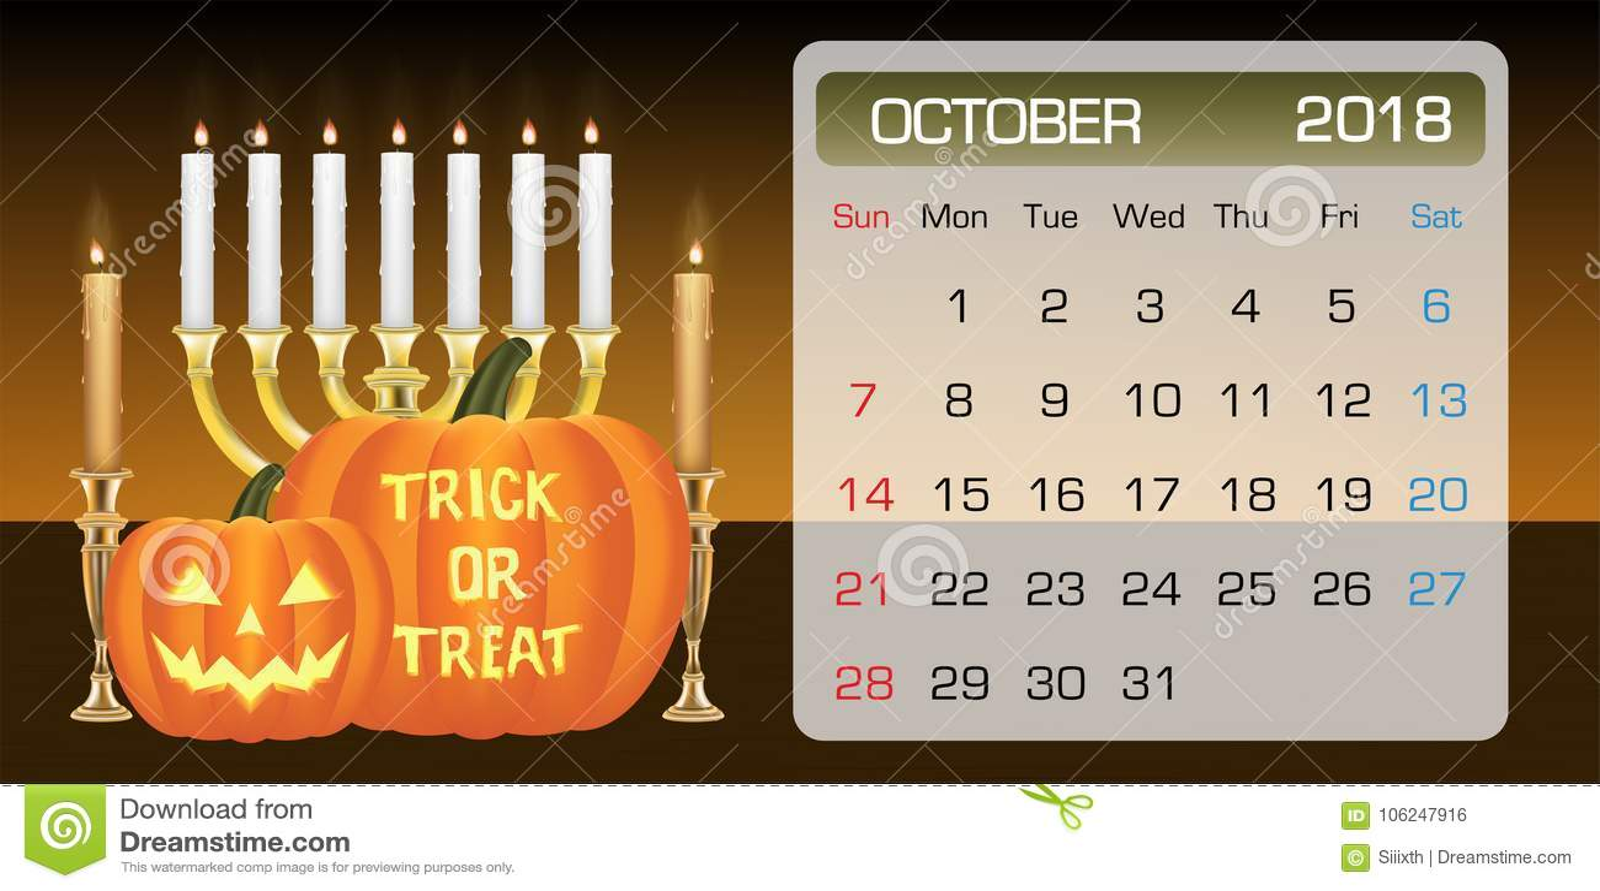 calendar of october 2018 month theme halloween